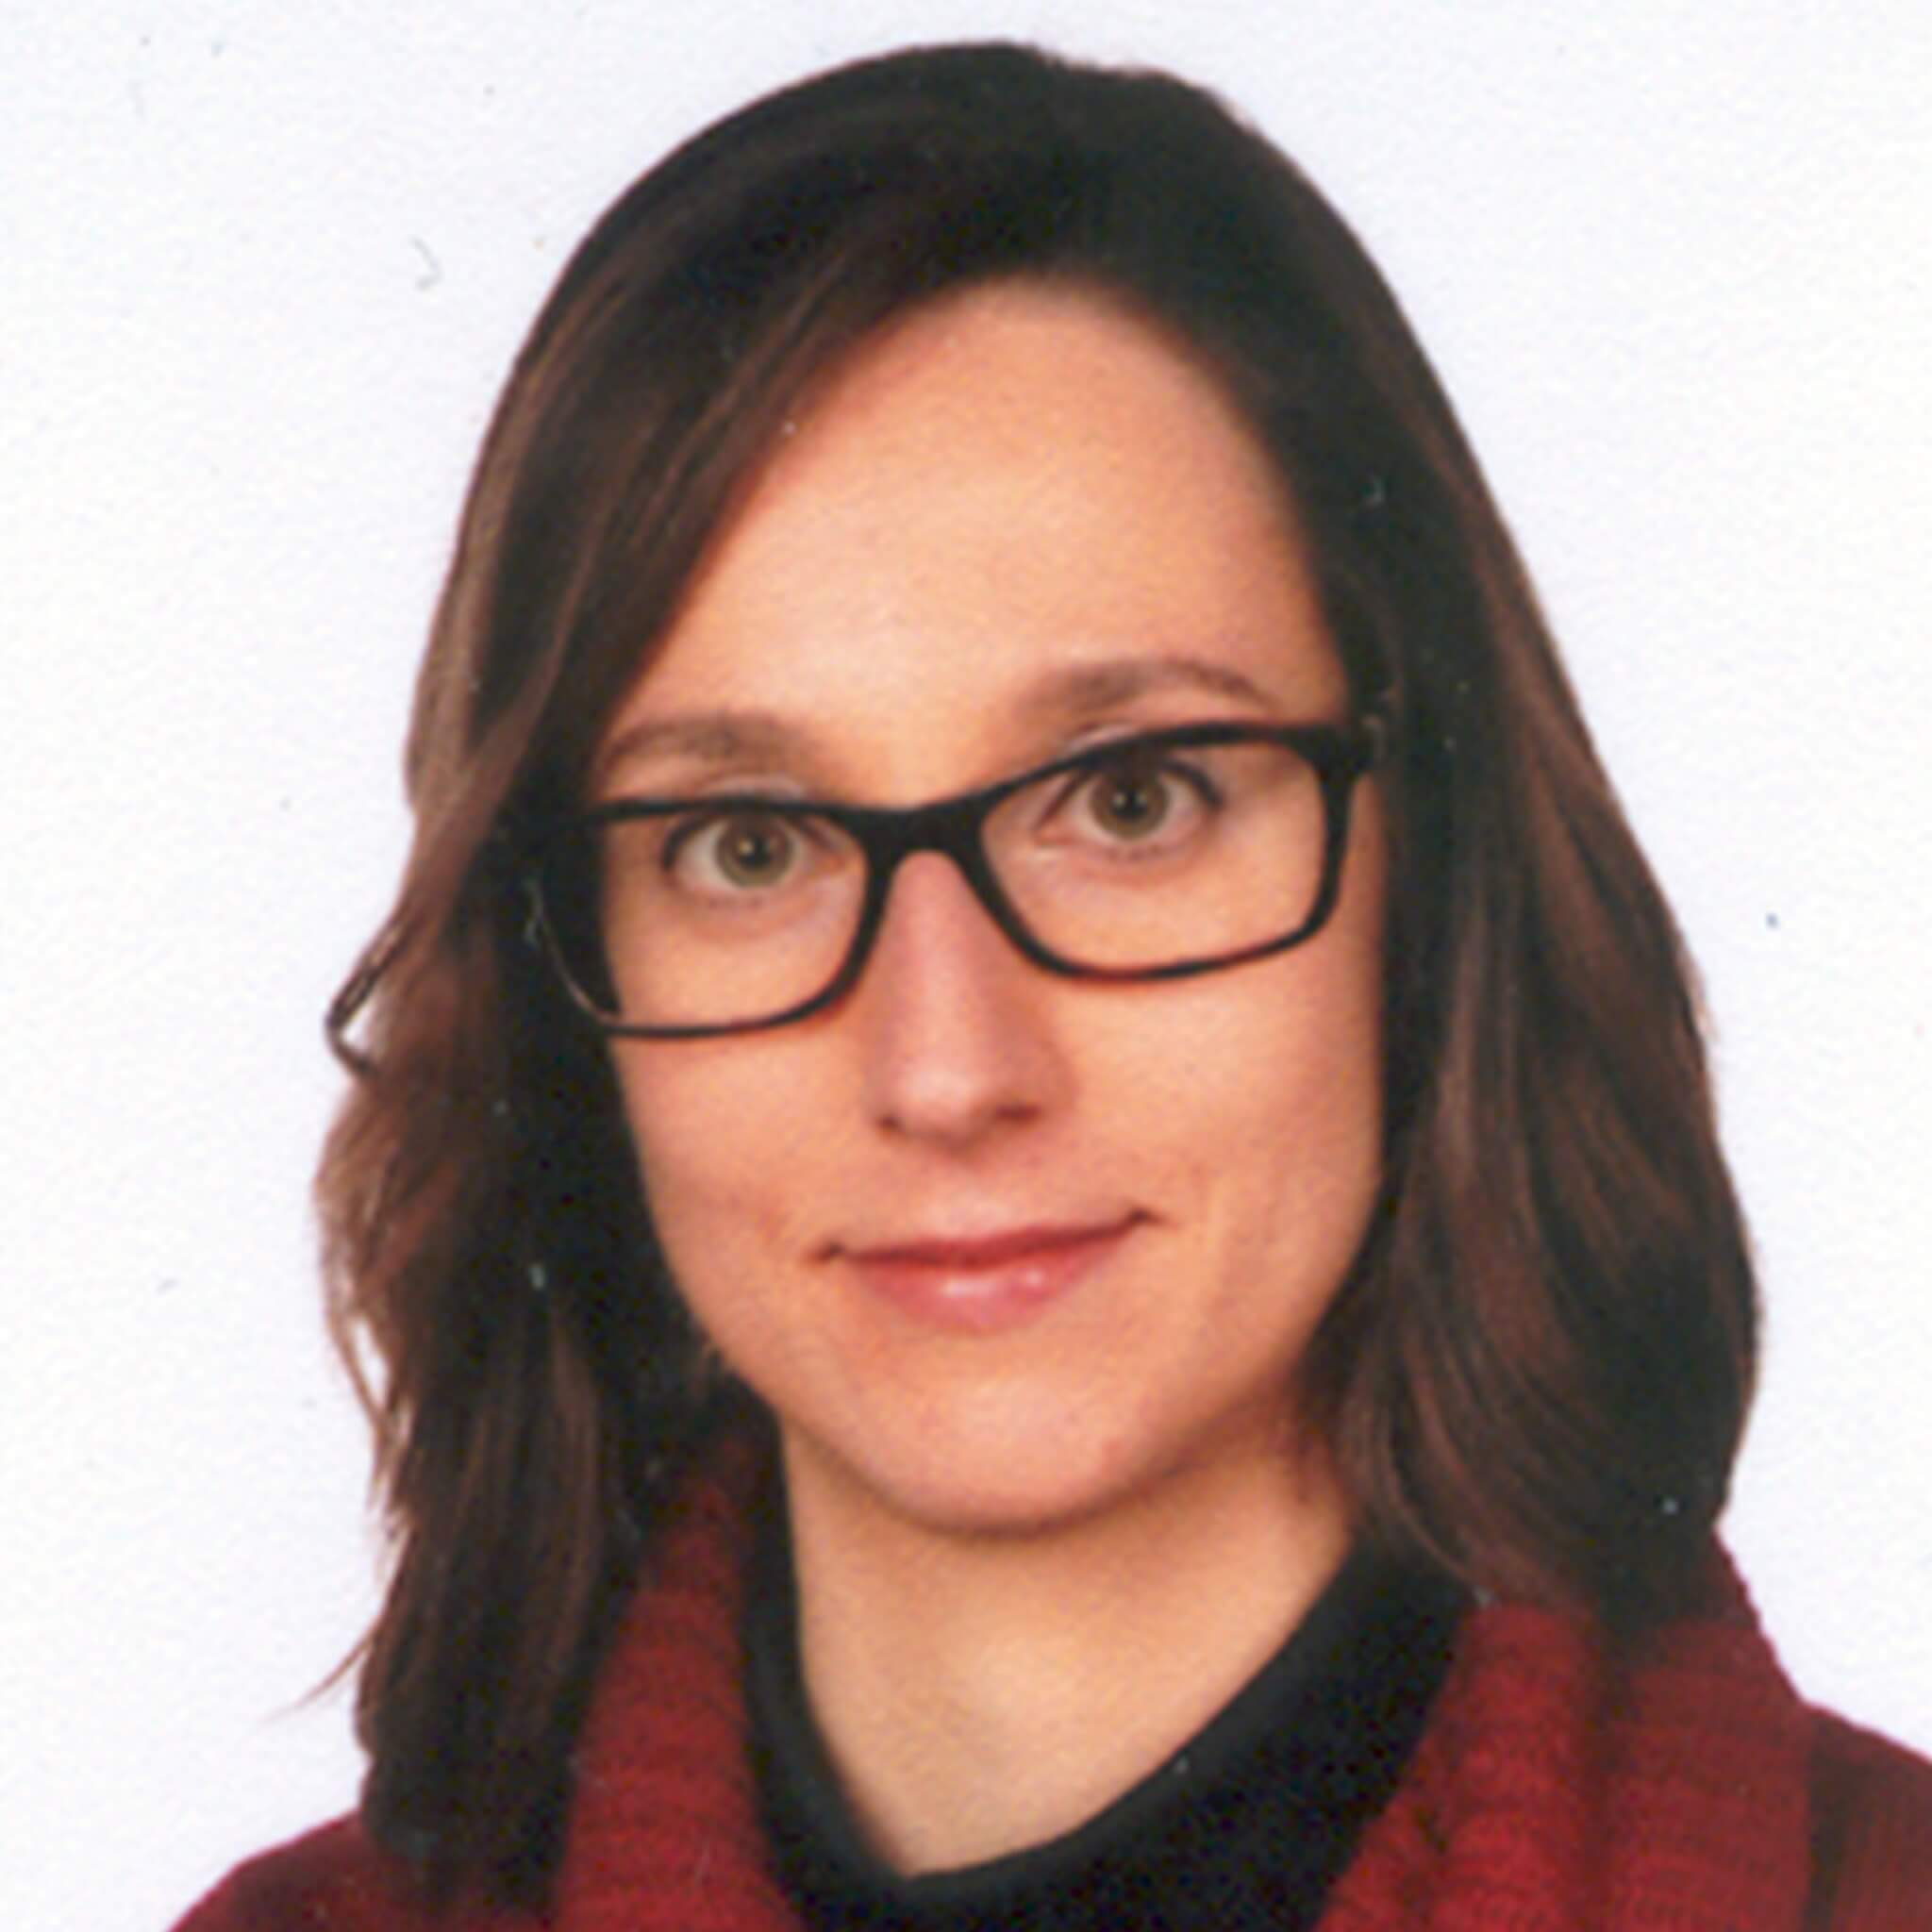 Sílvia Maria Pinto Ferreira